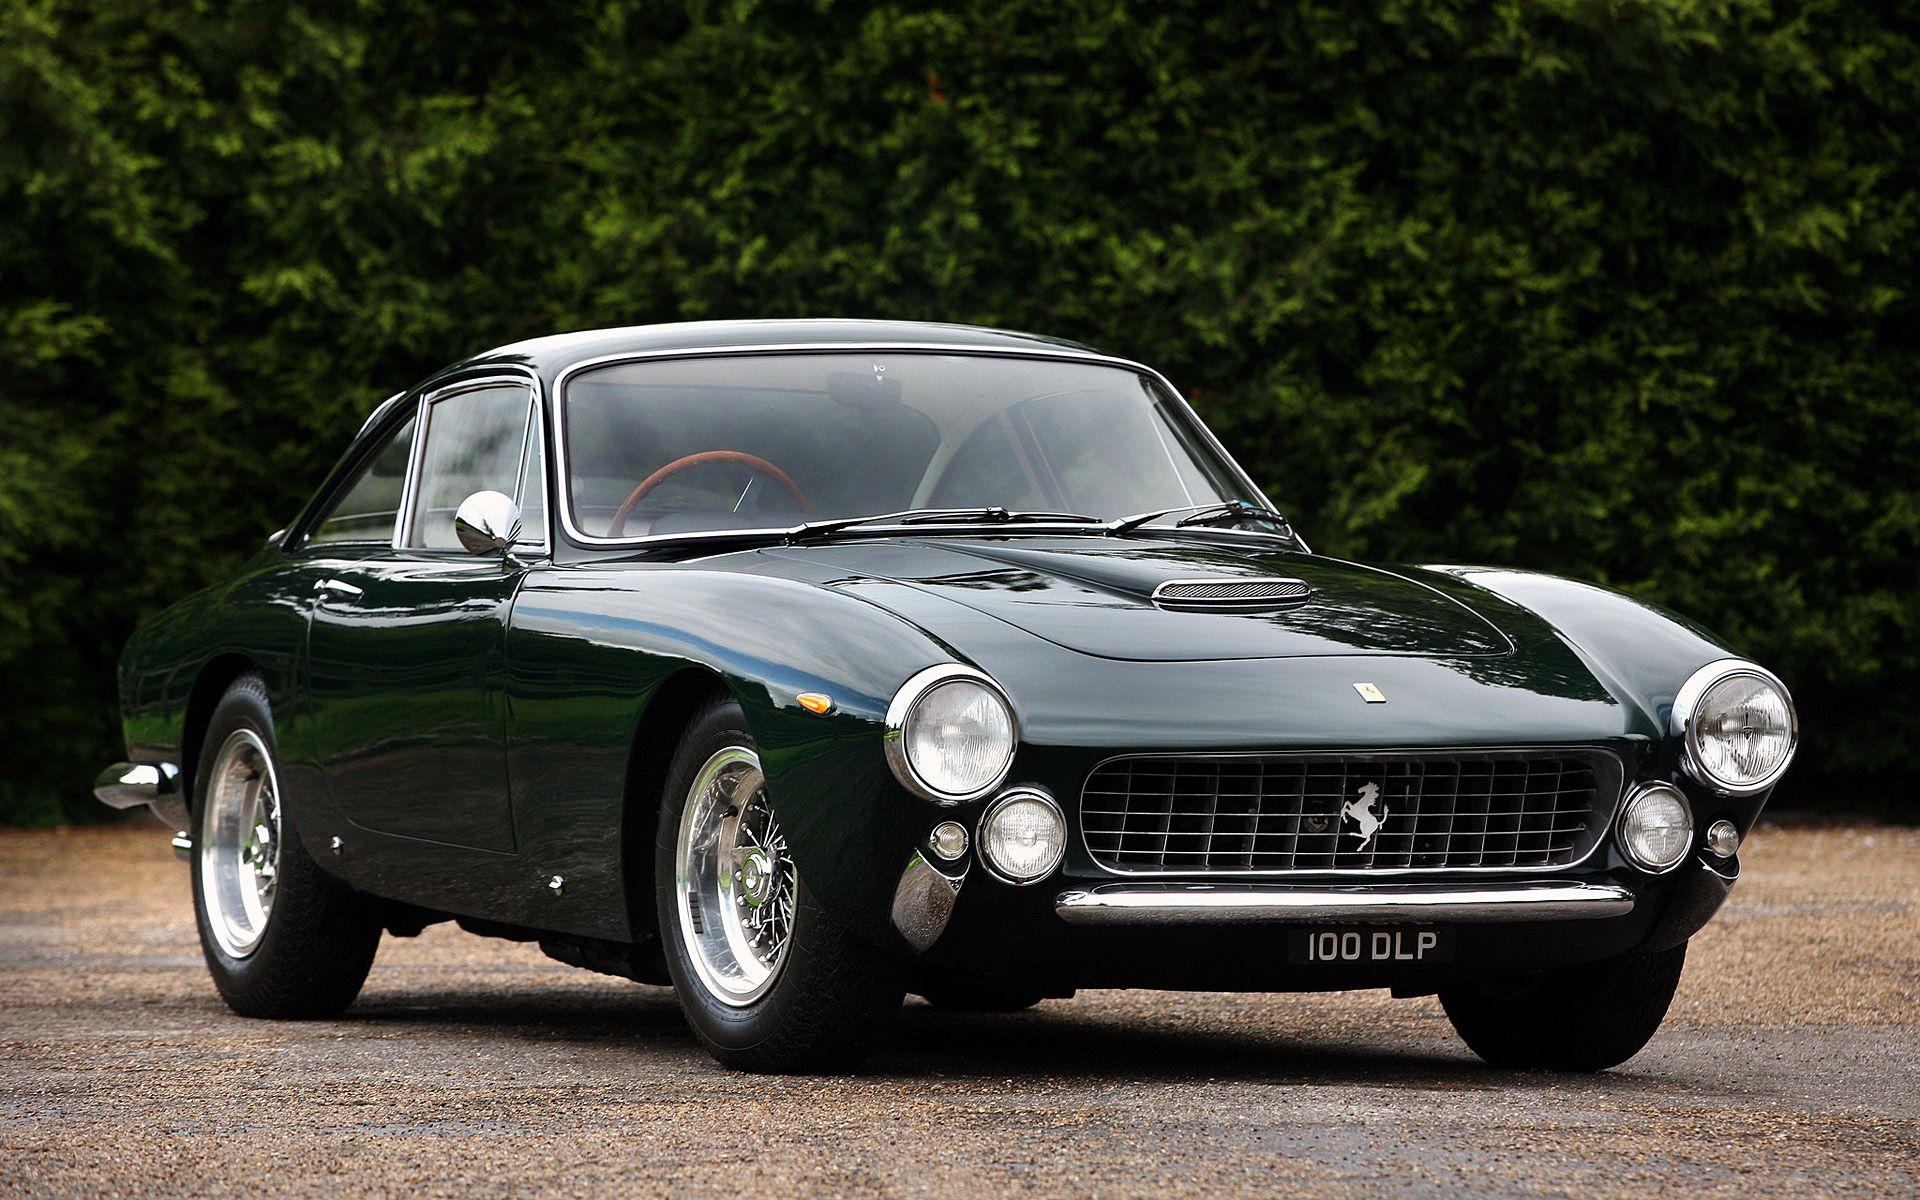 1963 Ferrari 250 Gt Lusso In 2020 Ferrari Car Ferrari Berlinetta Ferrari